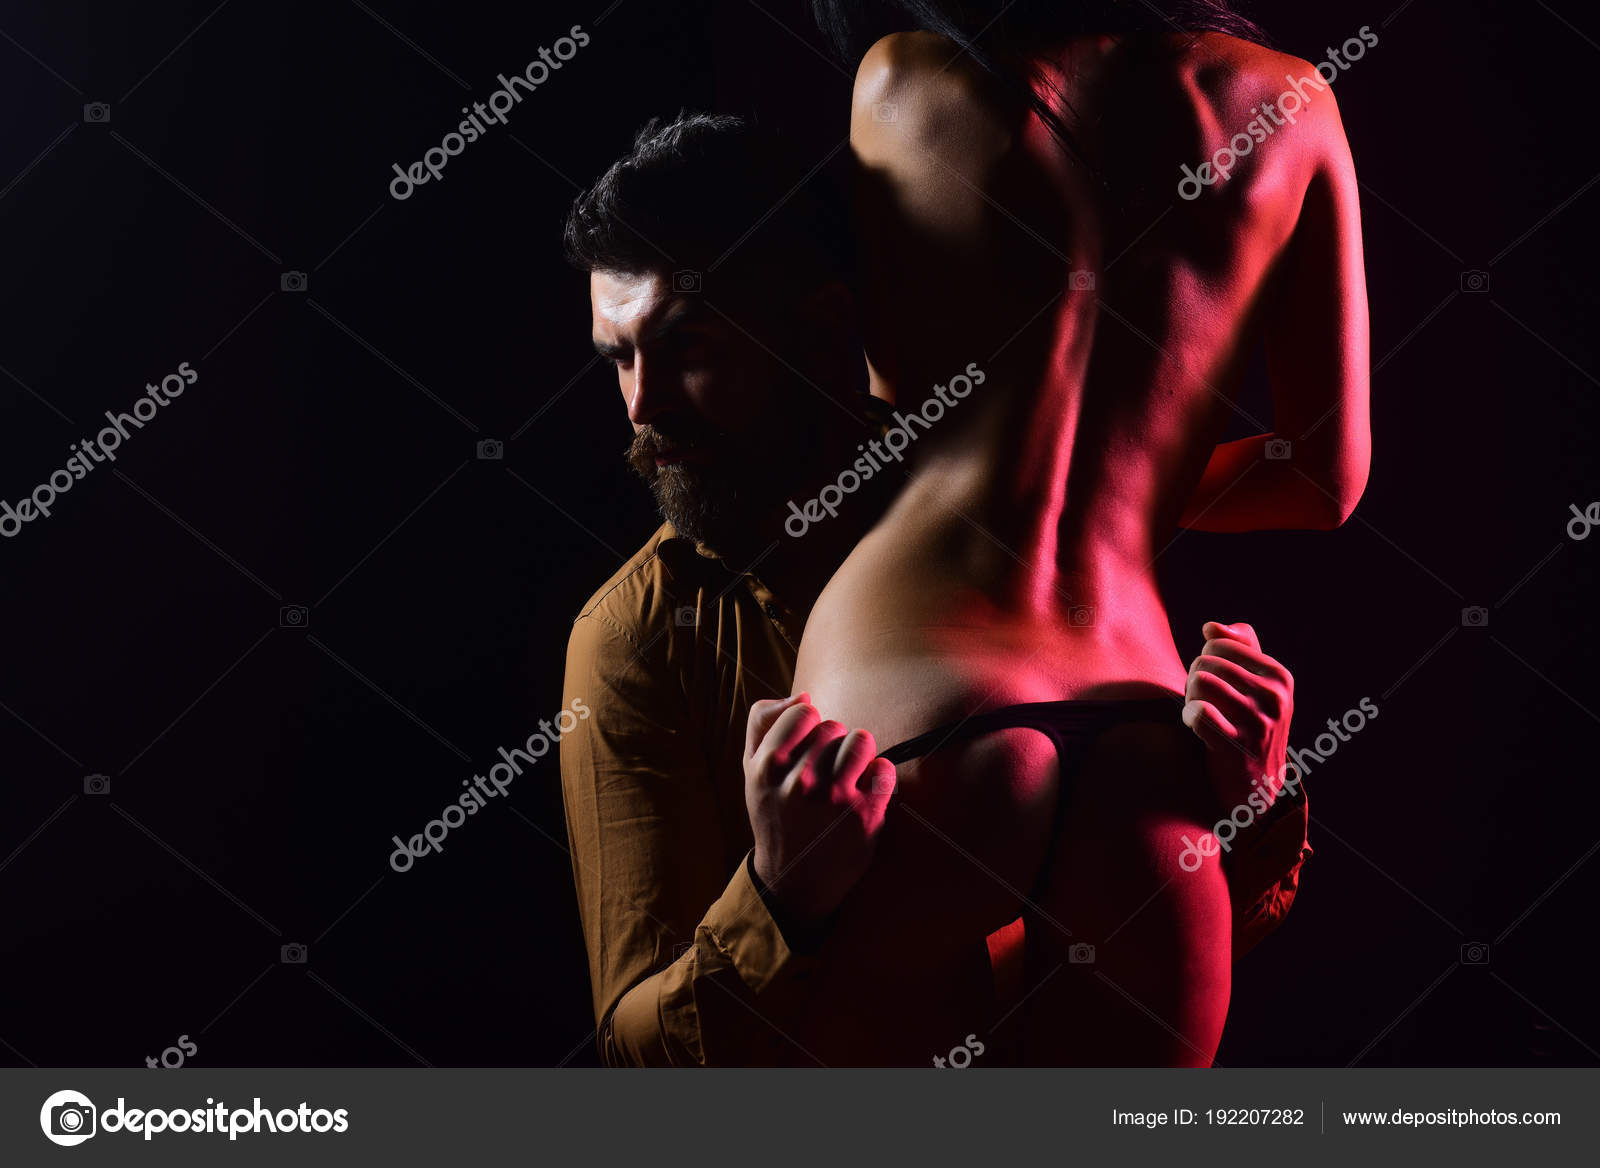 preliminaire feminin fille nue massage